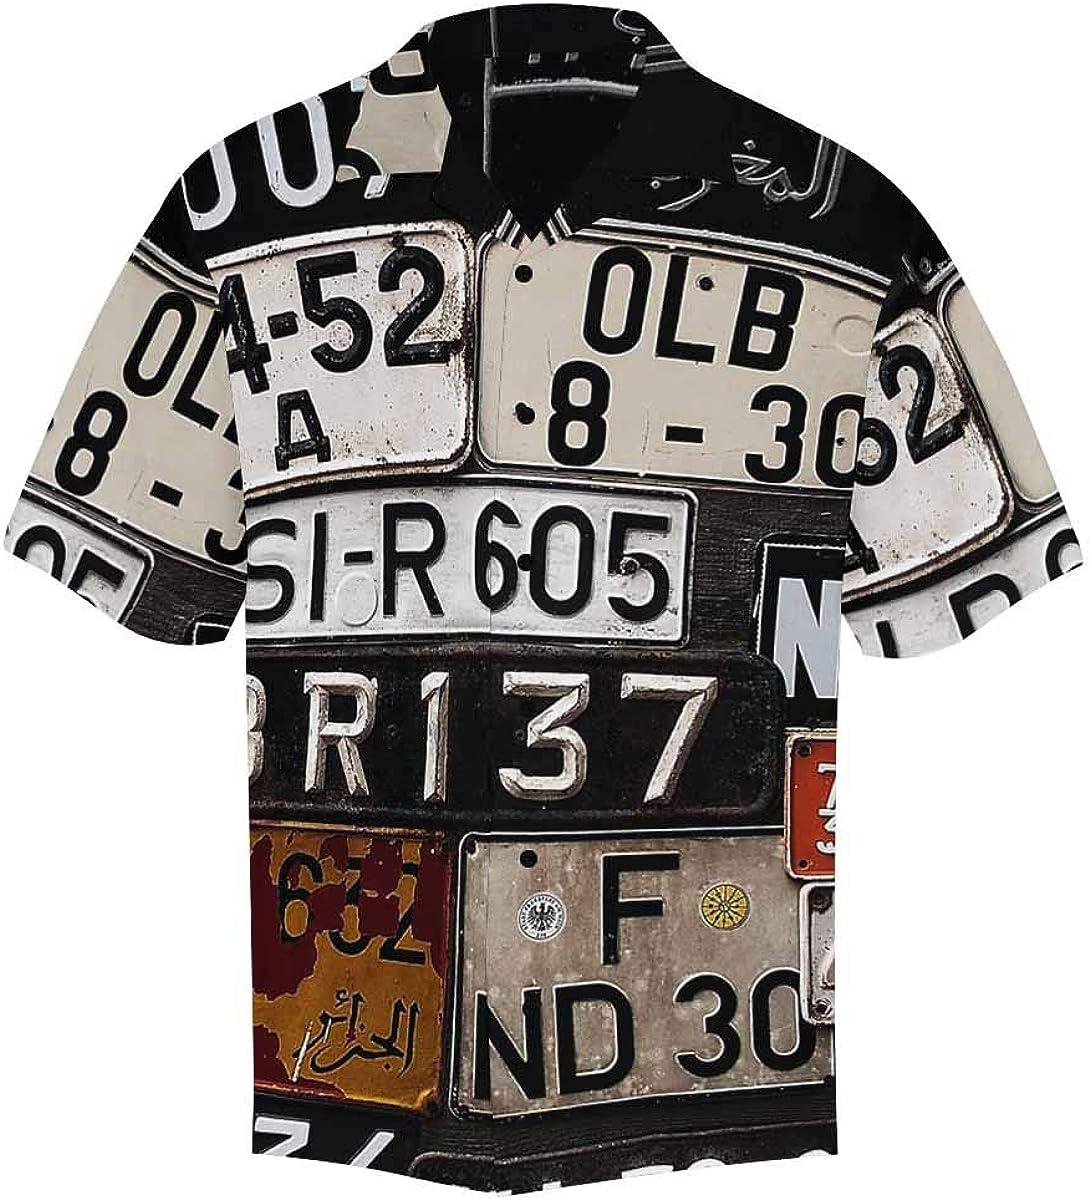 InterestPrint Men's Casual Button Down Short Sleeve Old Car License Hawaiian Shirt (S-5XL)